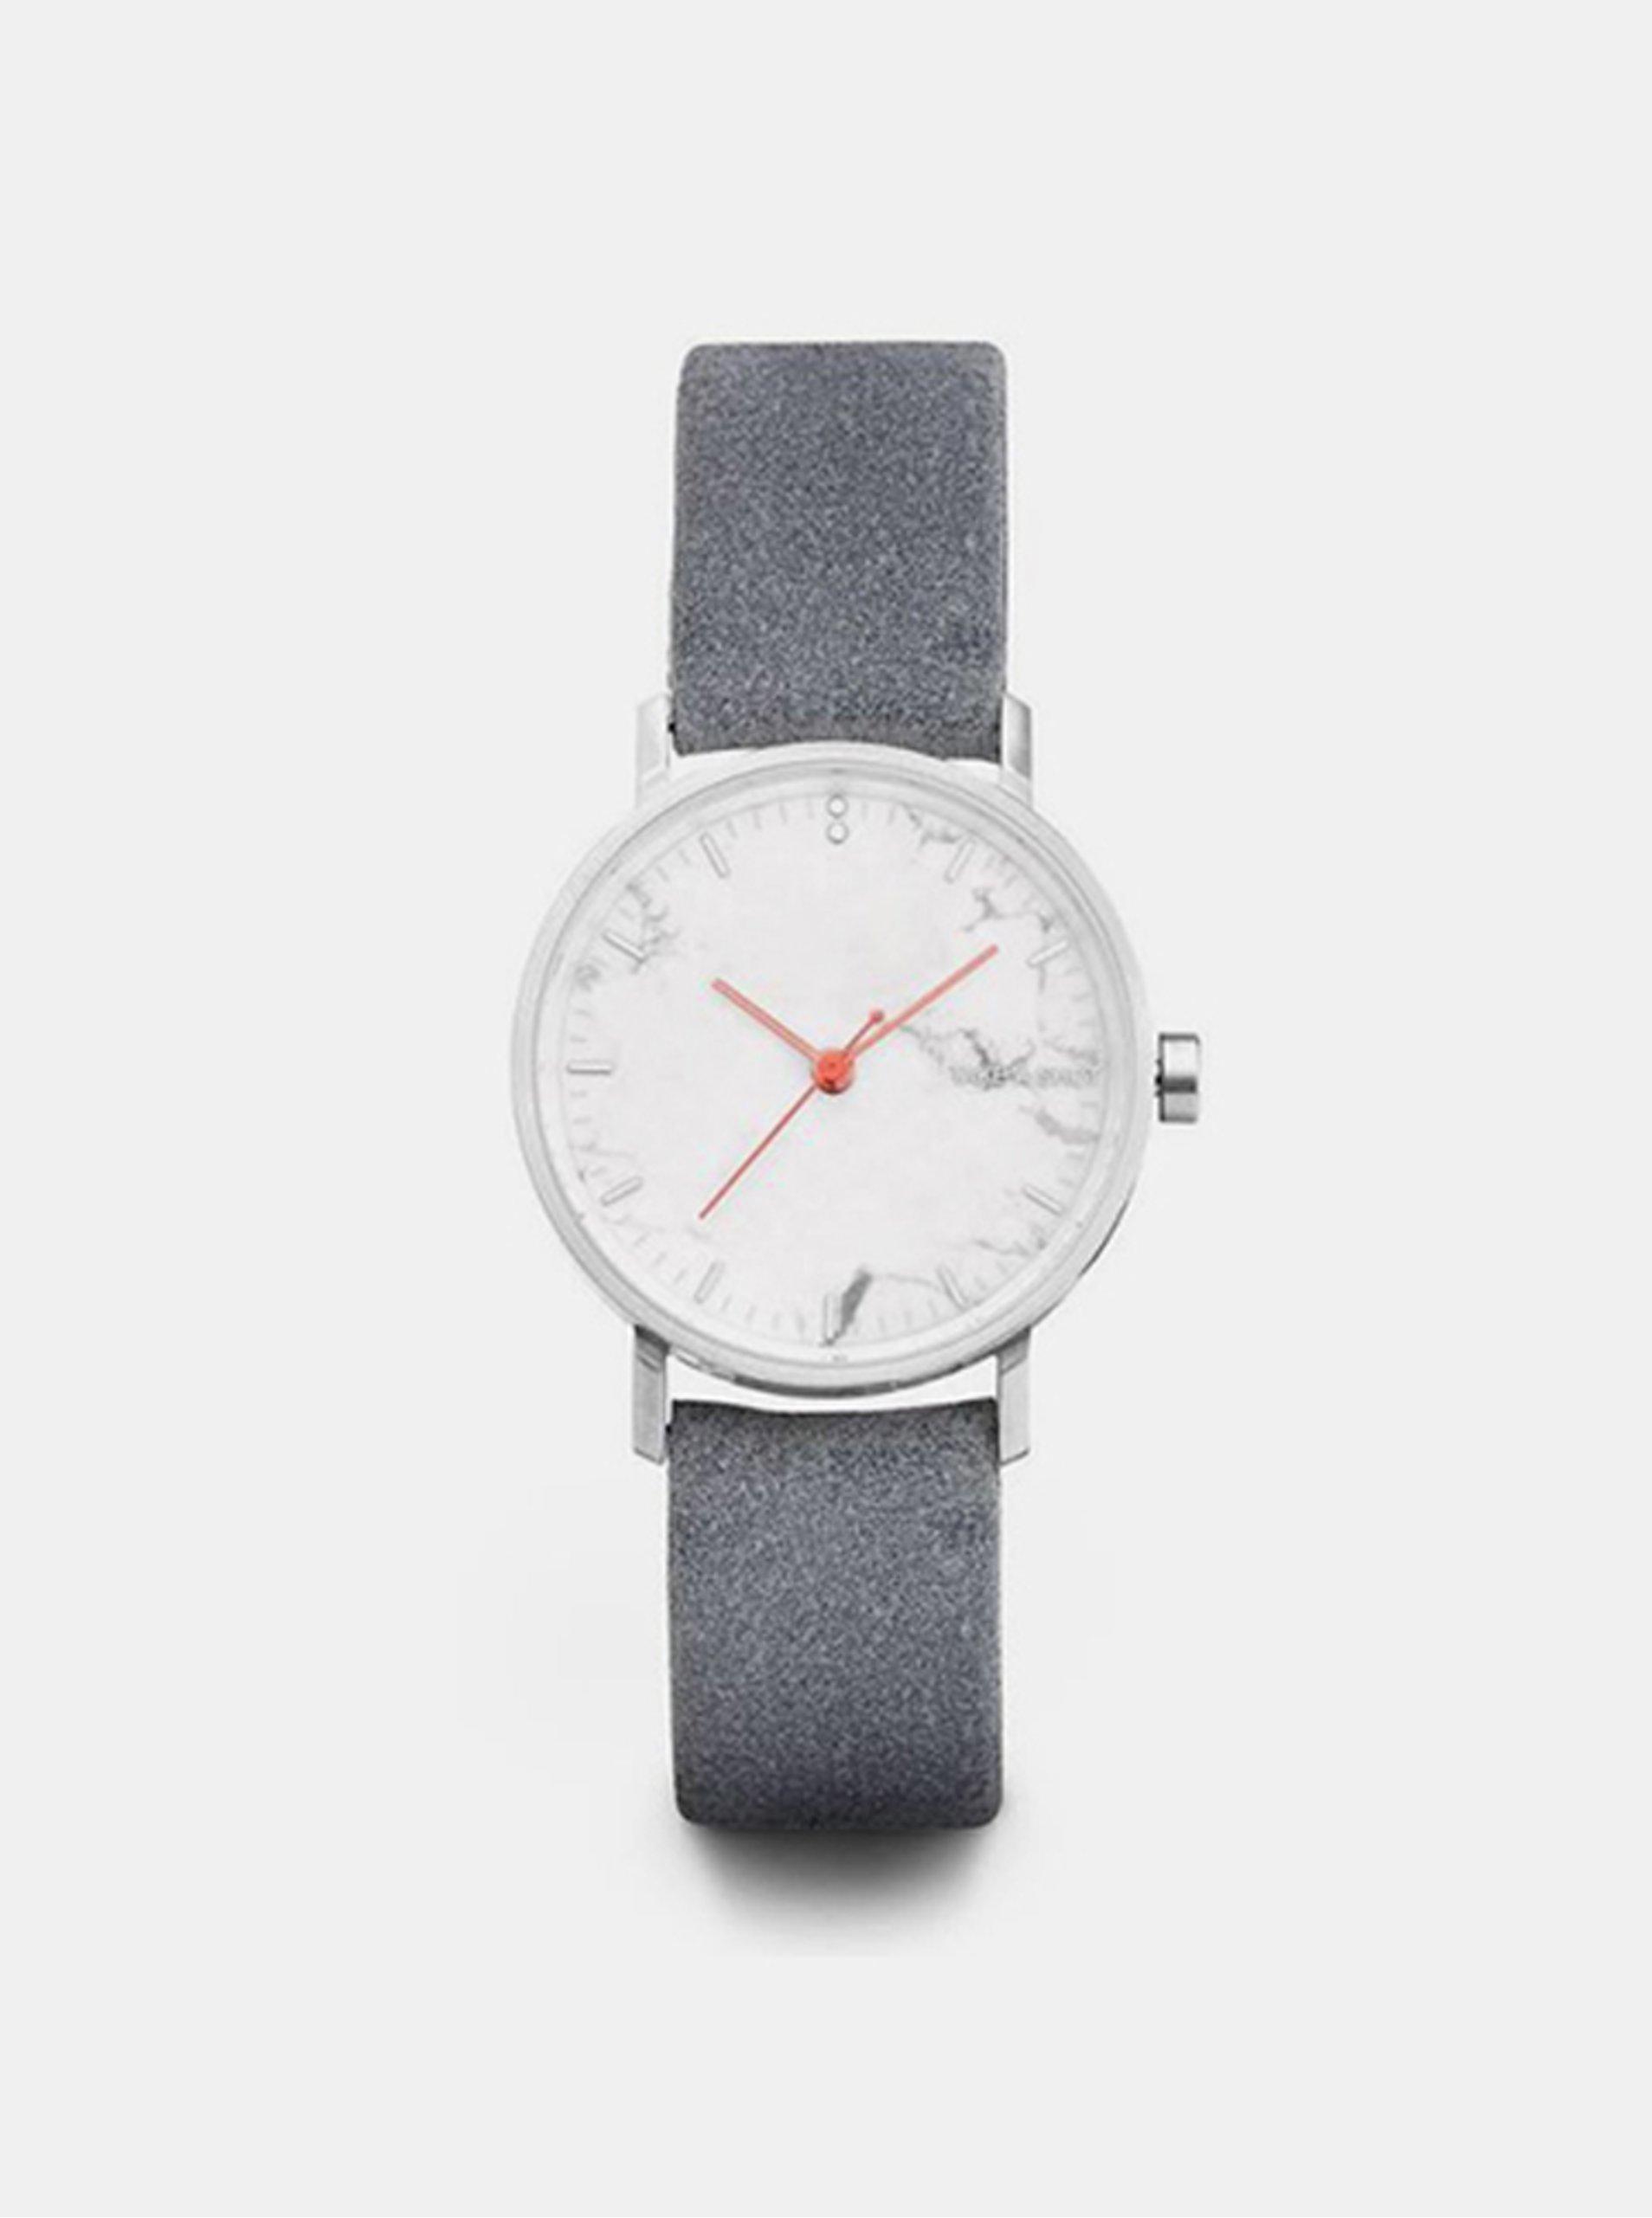 E-shop Mramorové hodinky Ivy Take A Shot